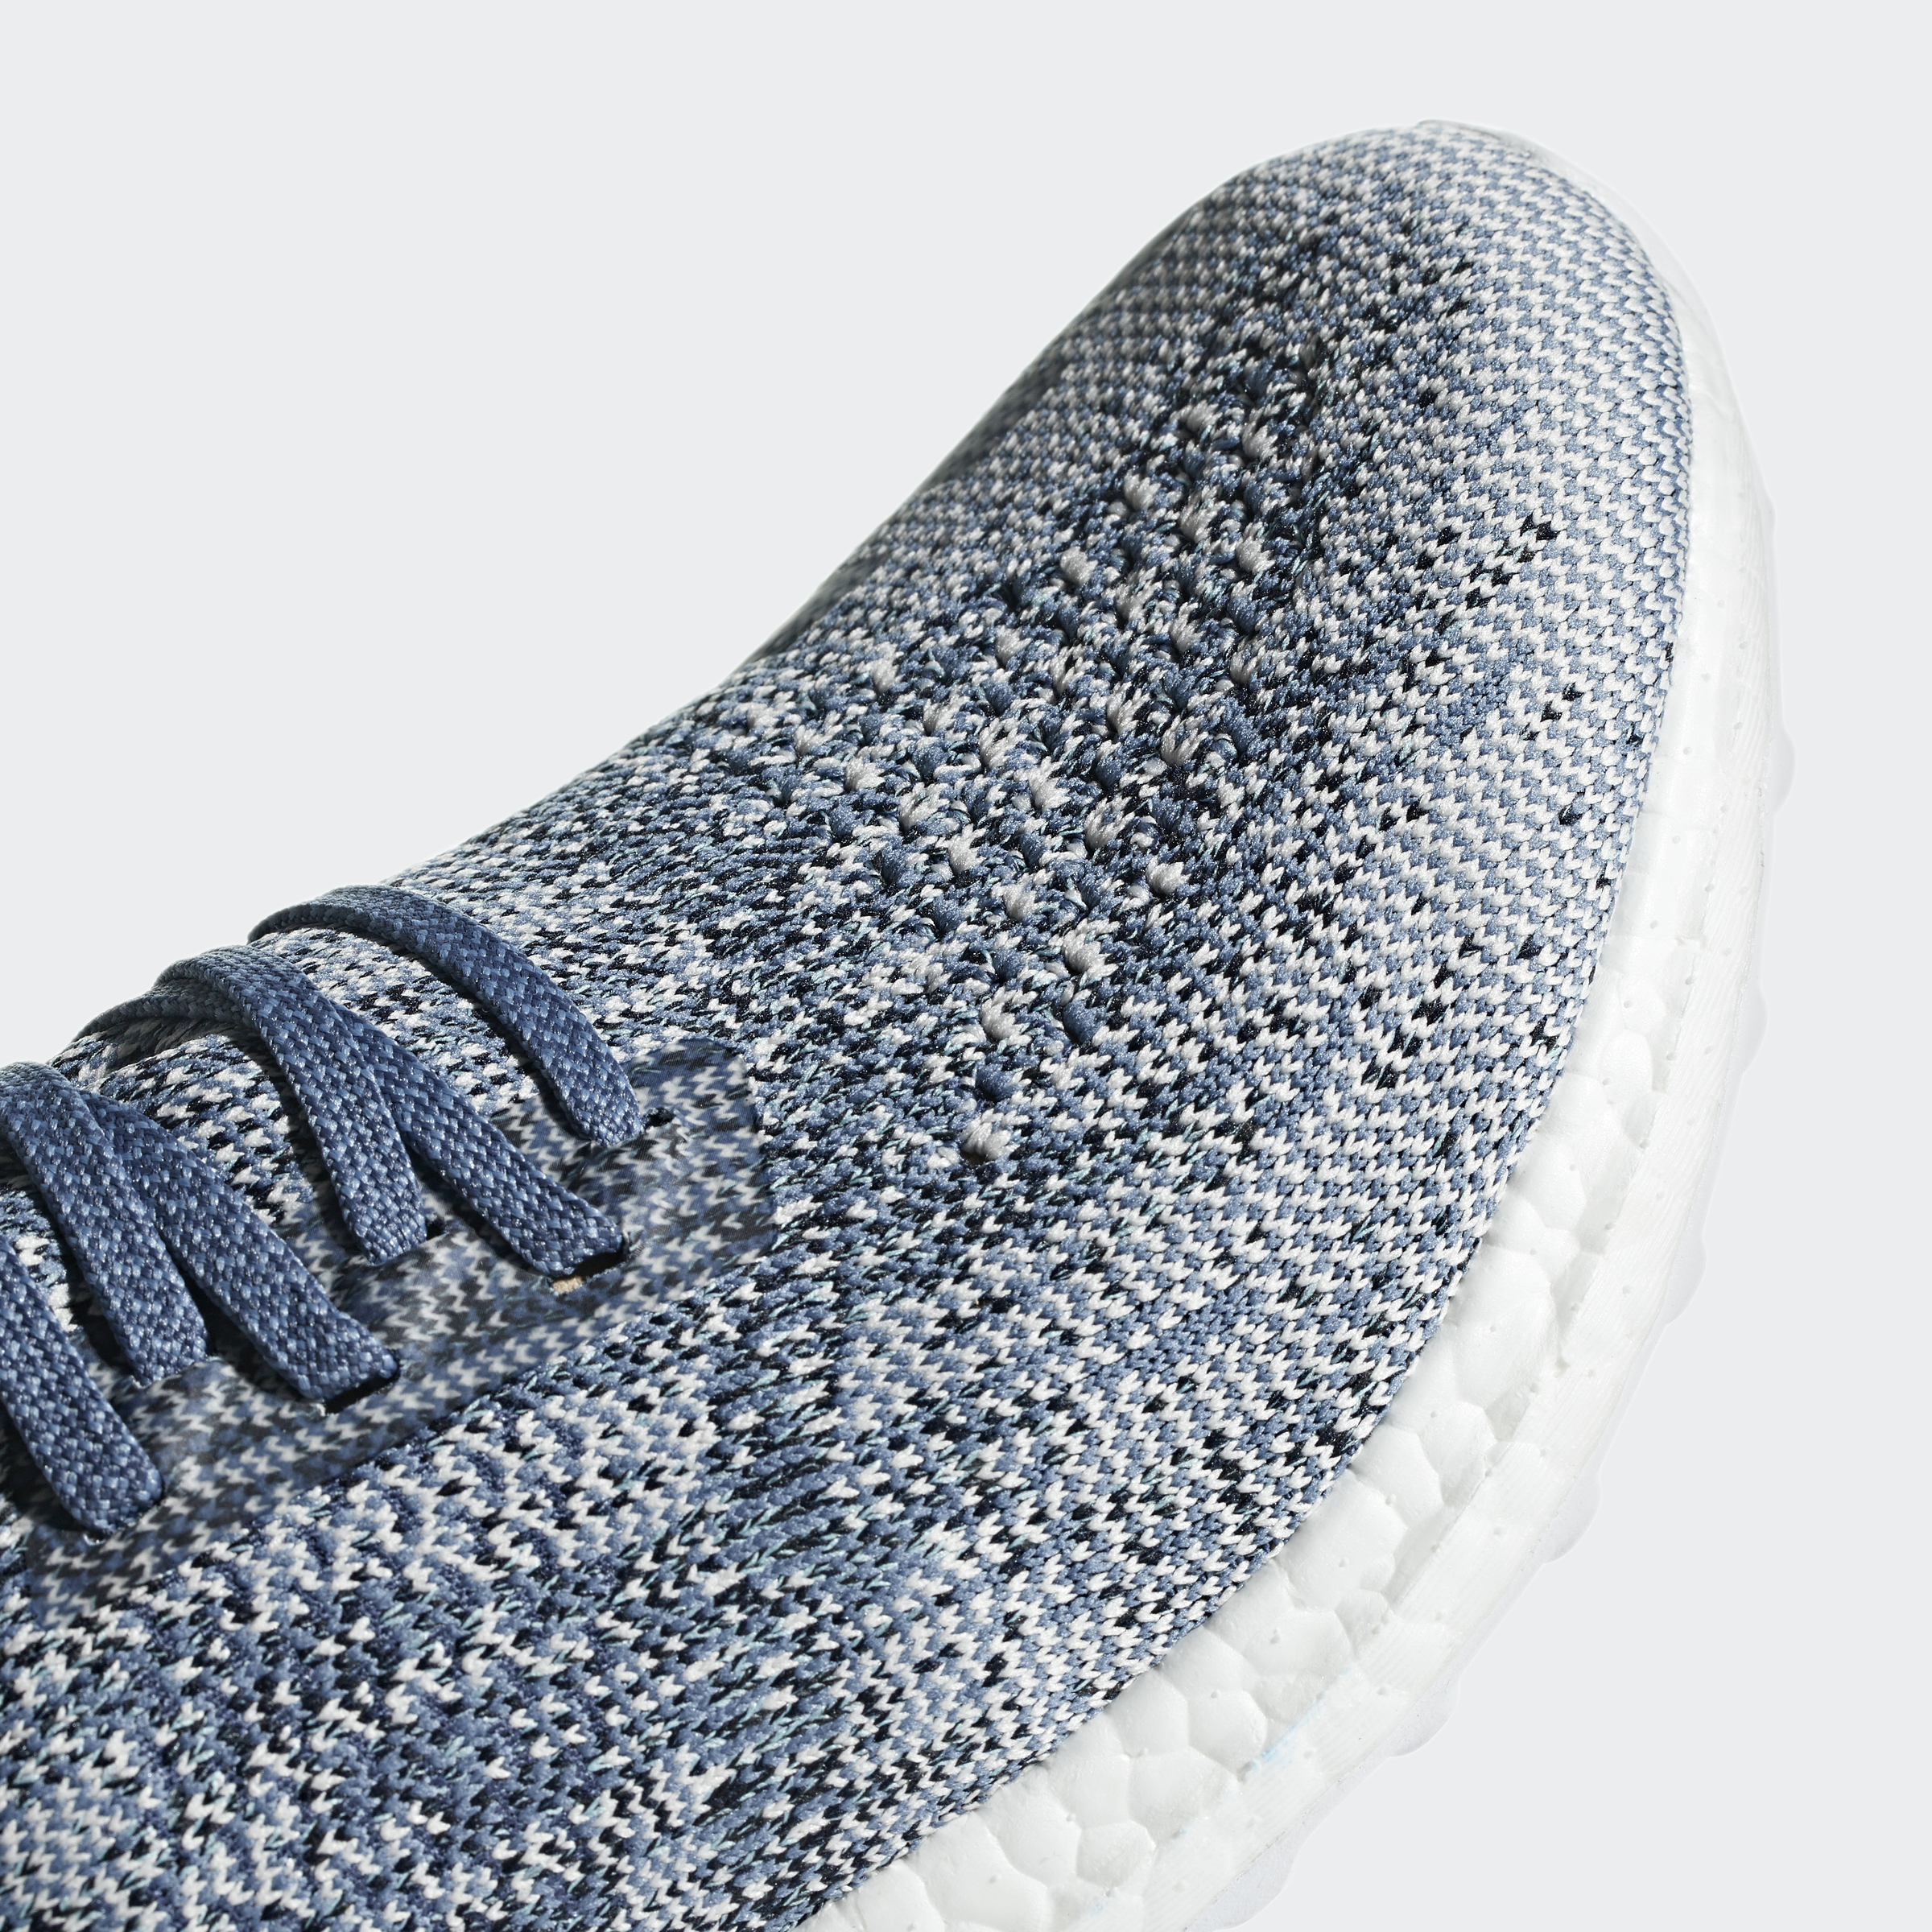 adidas UltraBOOST Uncaged Parley Schuh - blau   adidas Switzerland